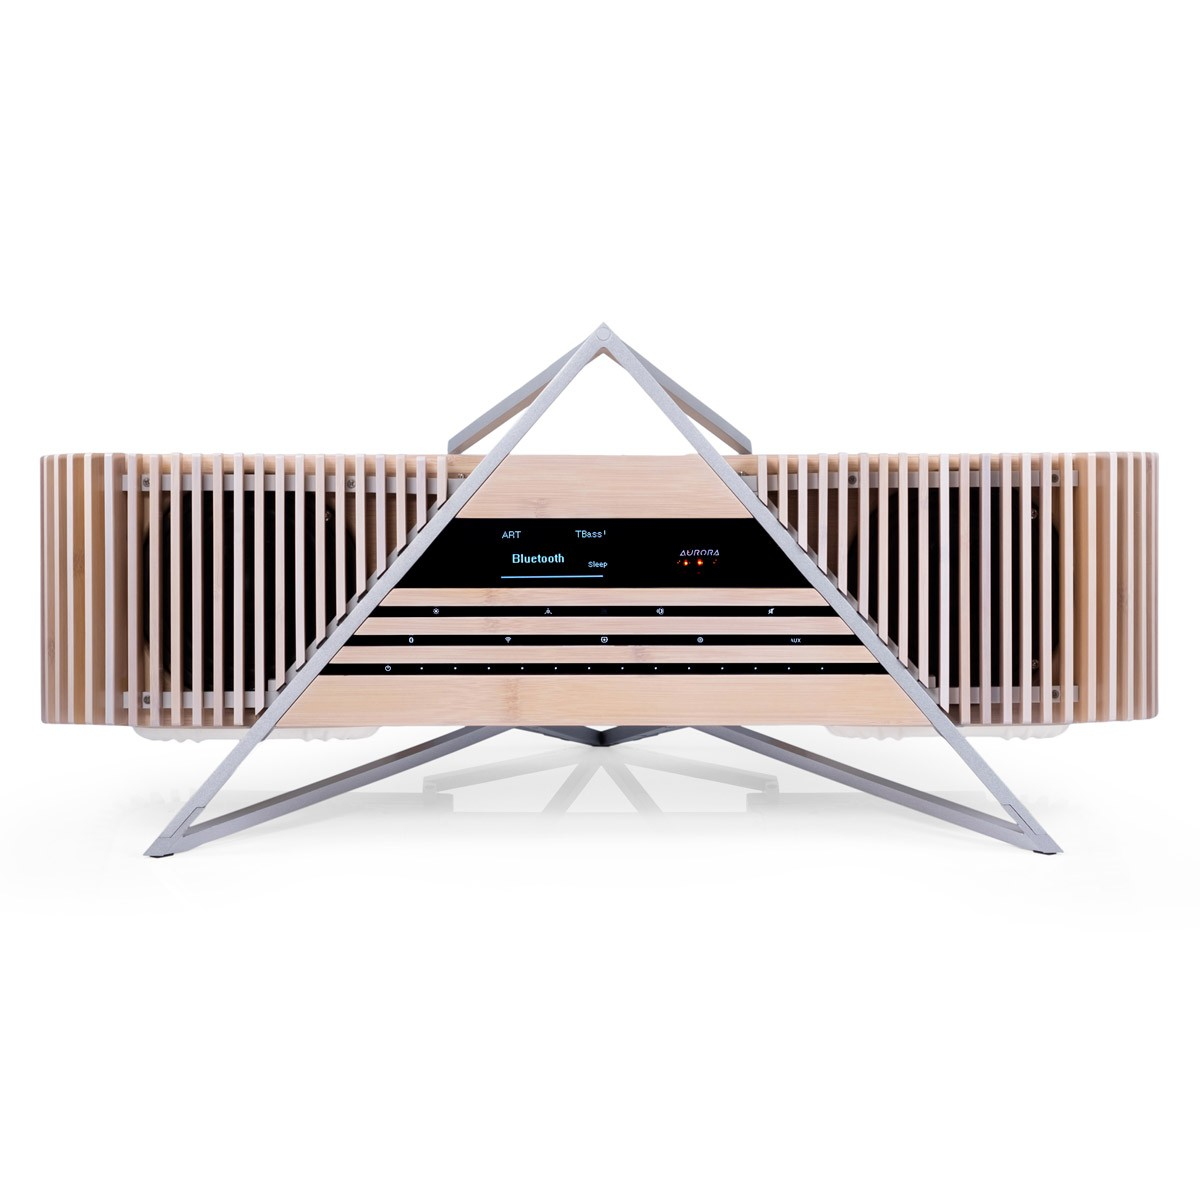 IFI AUDIO AURORA All in One Audiophile System ESS DAC Bluetooth 5.0 aptX LDAC HWA WiFi